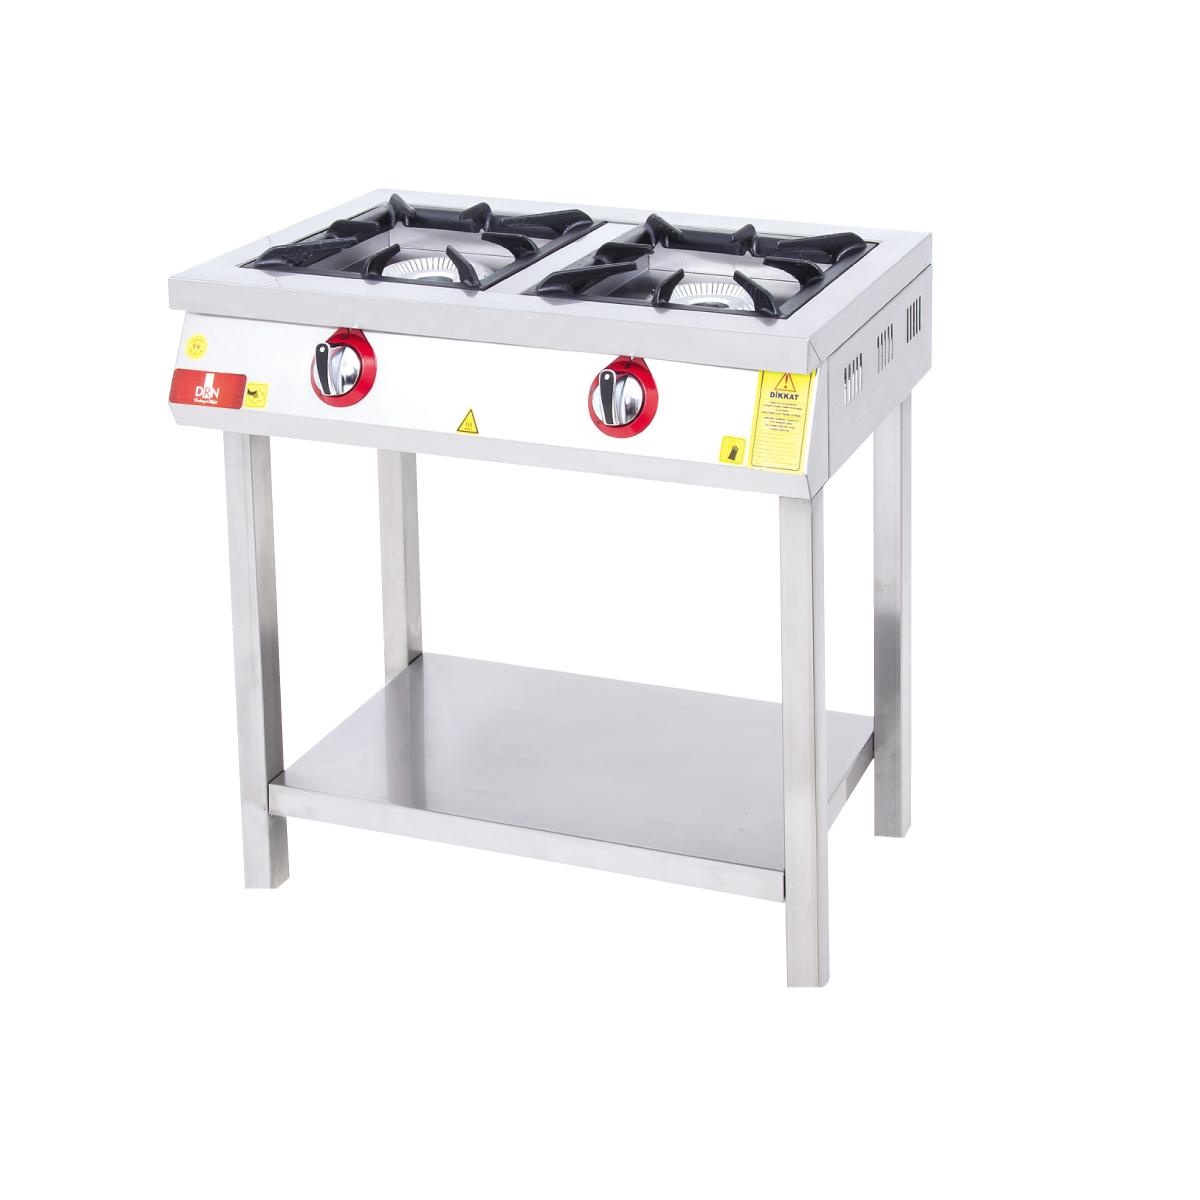 Range and Bottom-Shelf - 2 Burners - 80x45 - Gas